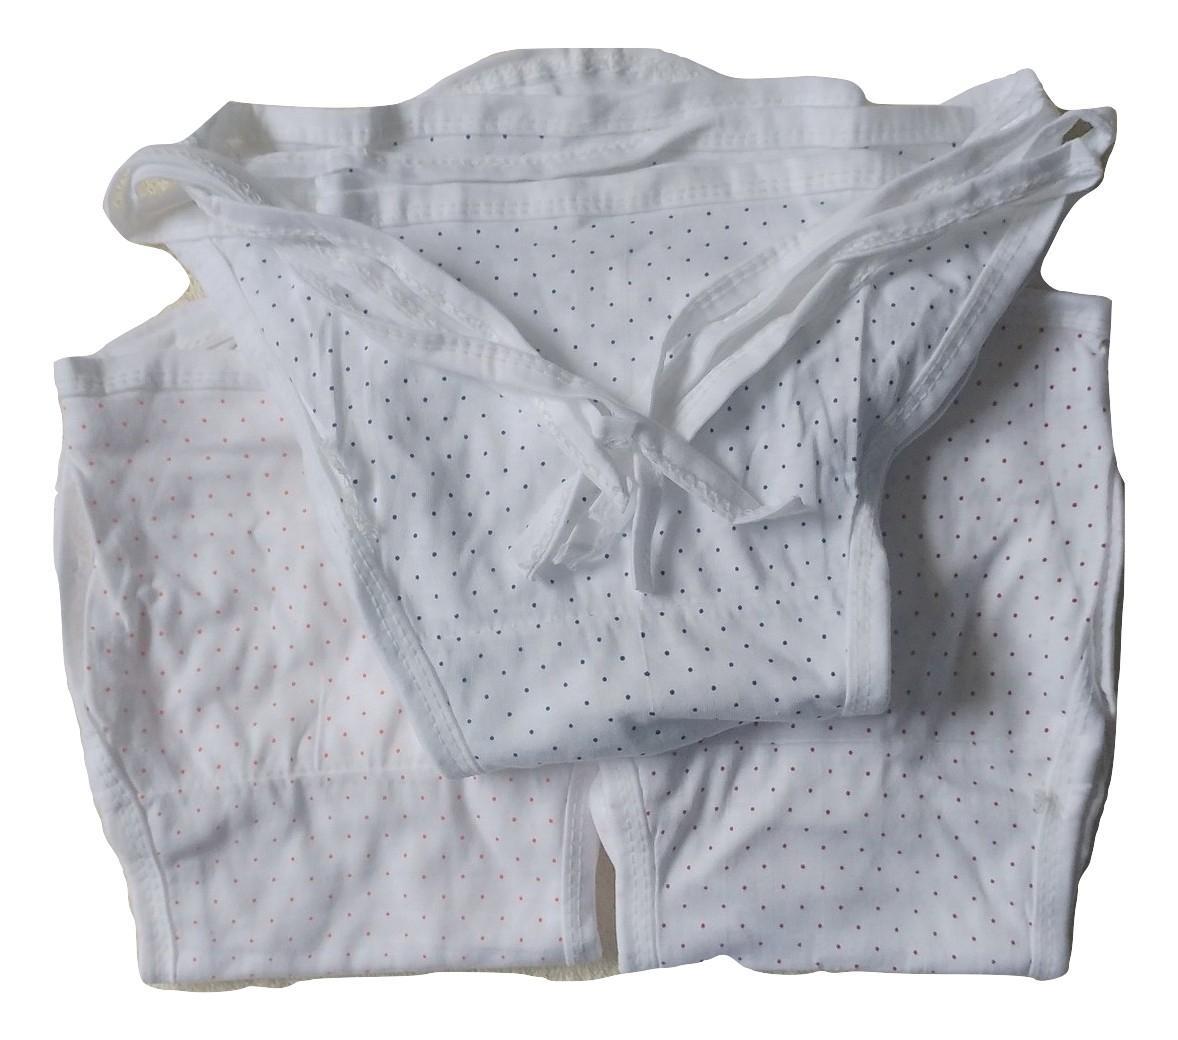 Jelova Angela Selusin Popok Baby Bayi Usagi DOTTY Premium Quality - SNI Standart - 12pcs -